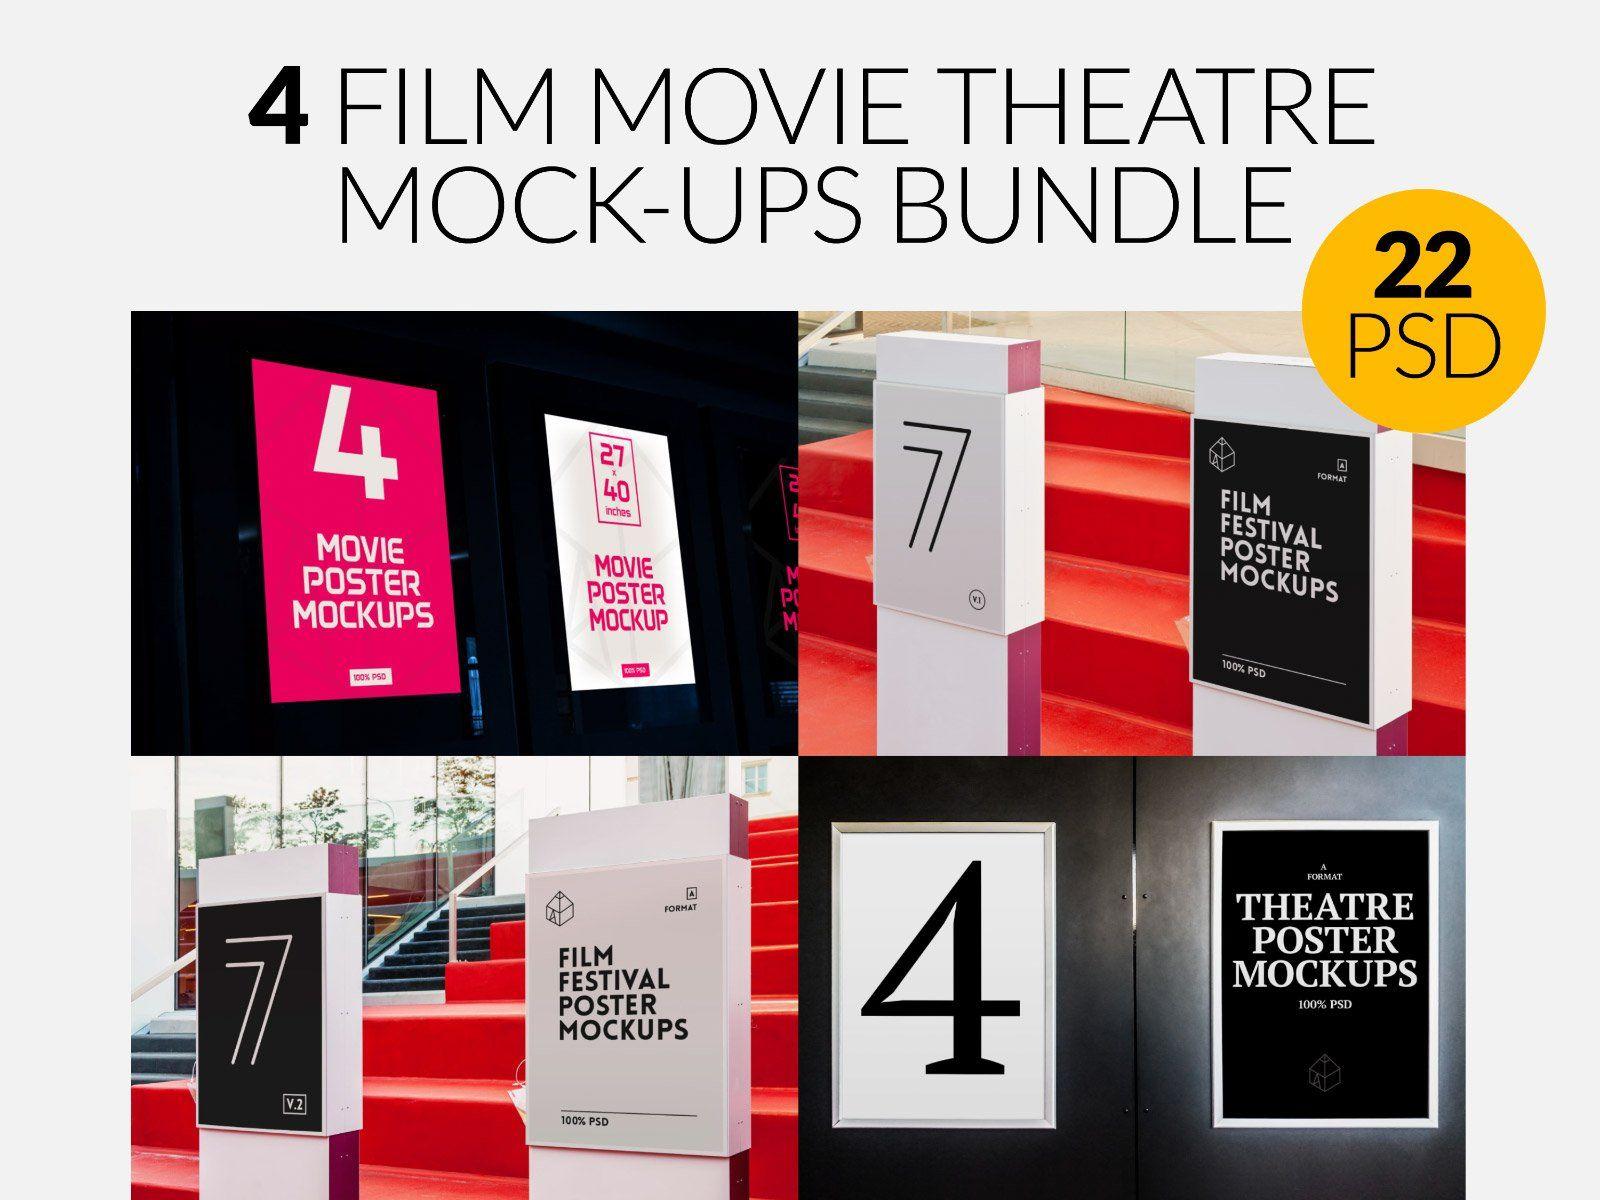 4 Film Movie Theatre Poster Mock Ups Theatre Poster Poster Mockup Film Movie